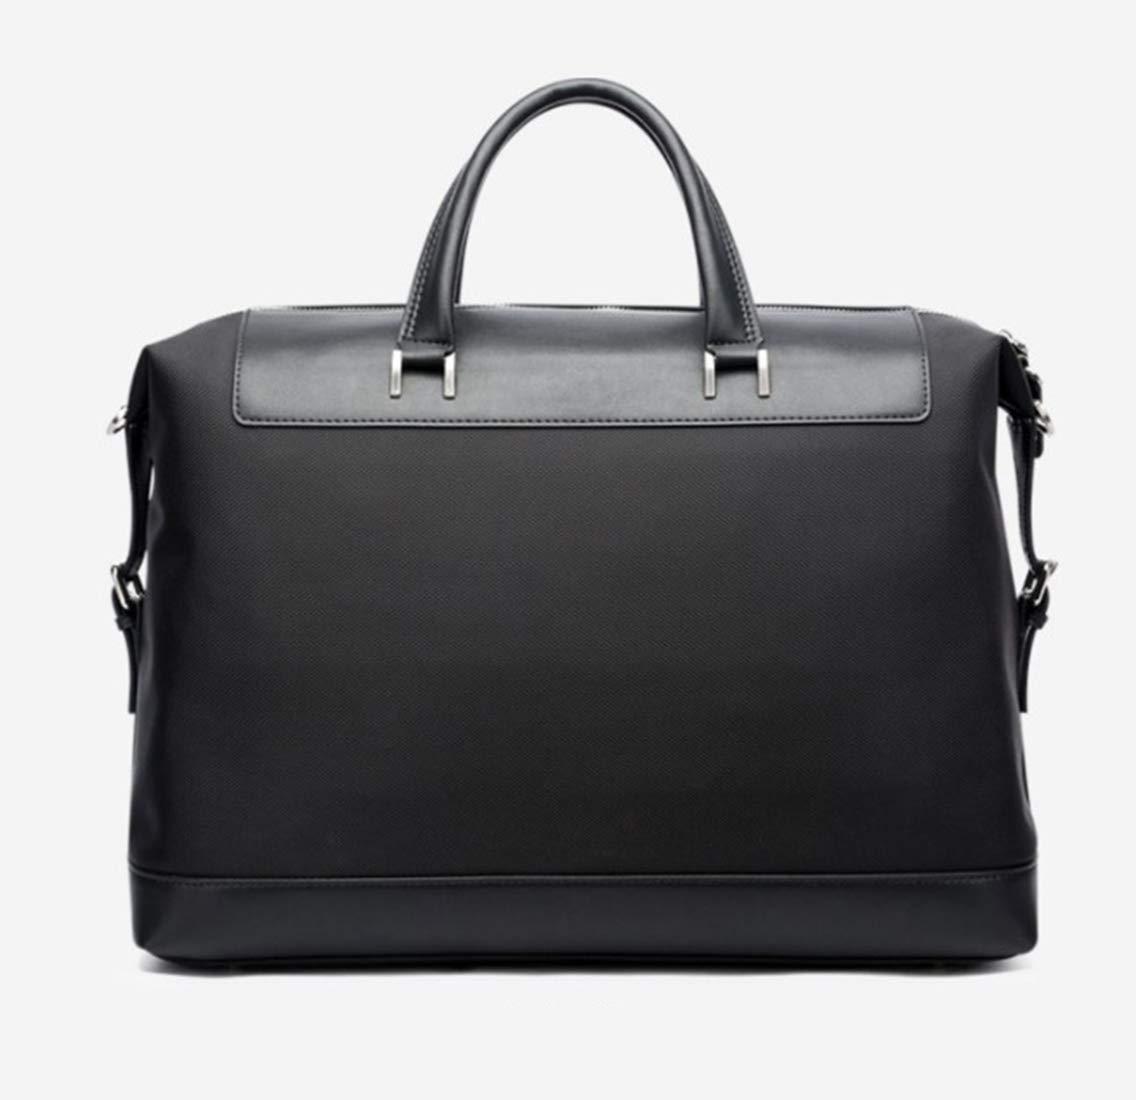 Color : Black MATCHANT Travel Bag Shoulder Diagonal Travel Bag Mens Handbags Business Oxford Luggage Bags Large Capacity Travel Bags